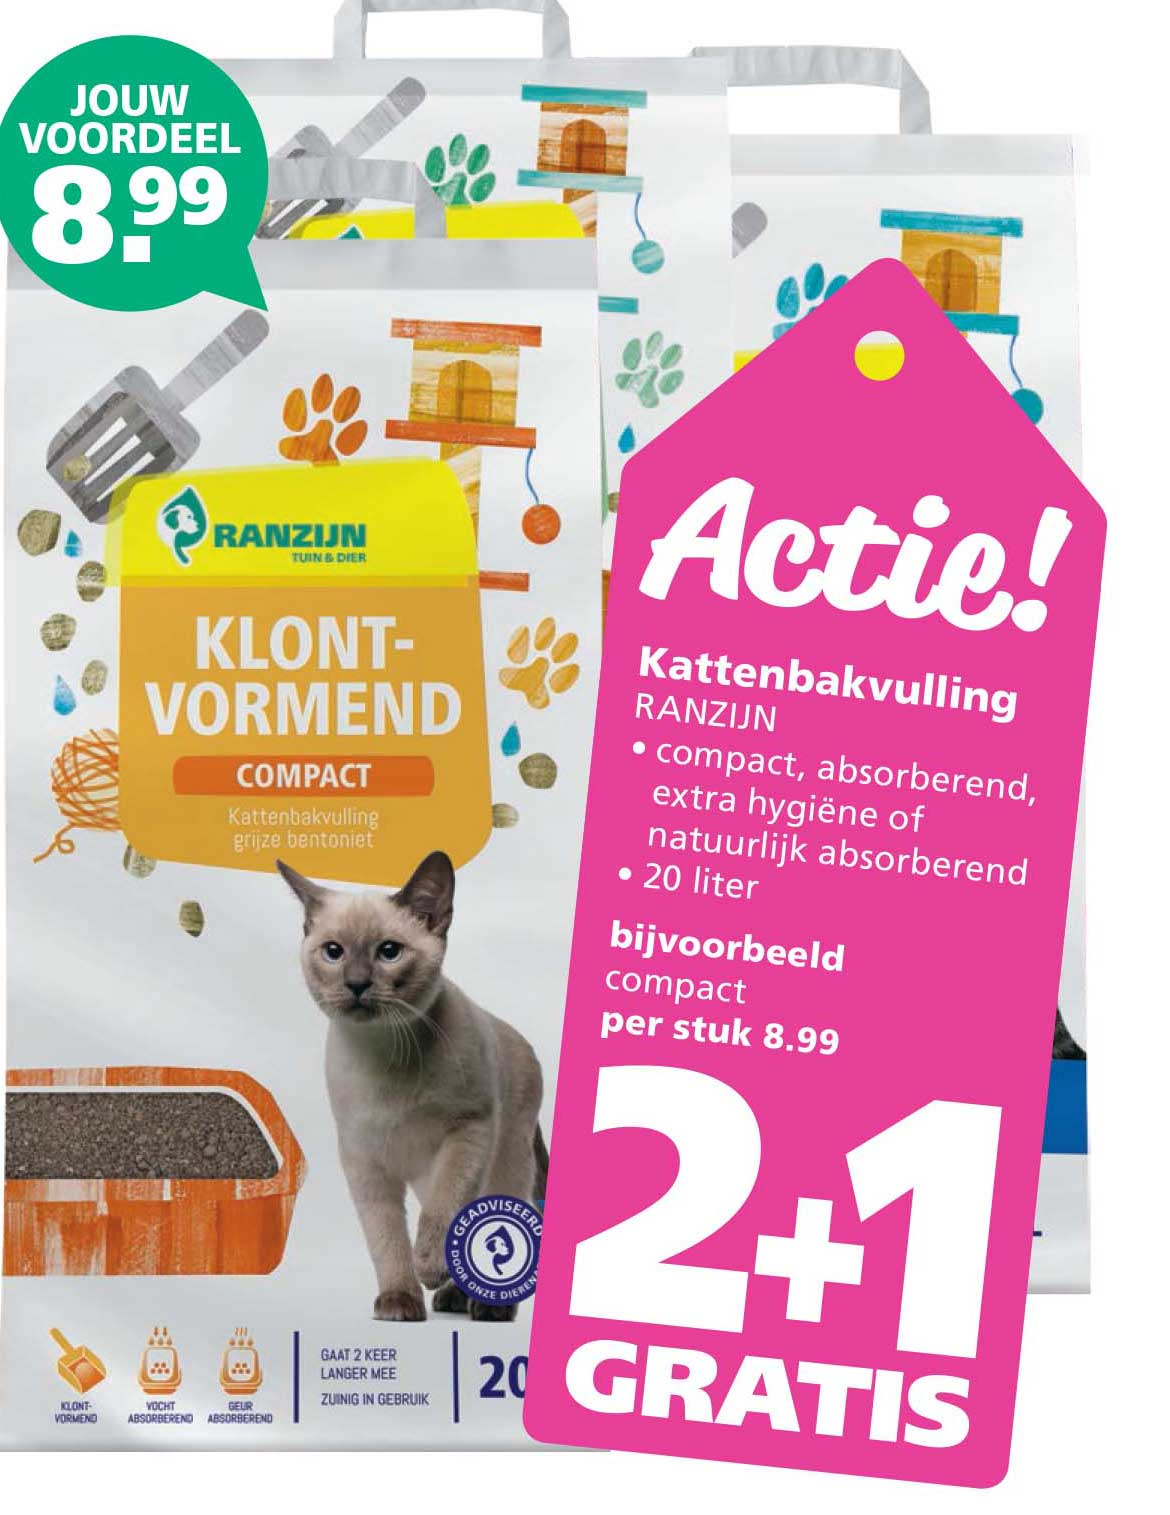 Ranzijn Tuin & Dier Kattenbakvulling: 2+1 Gratis